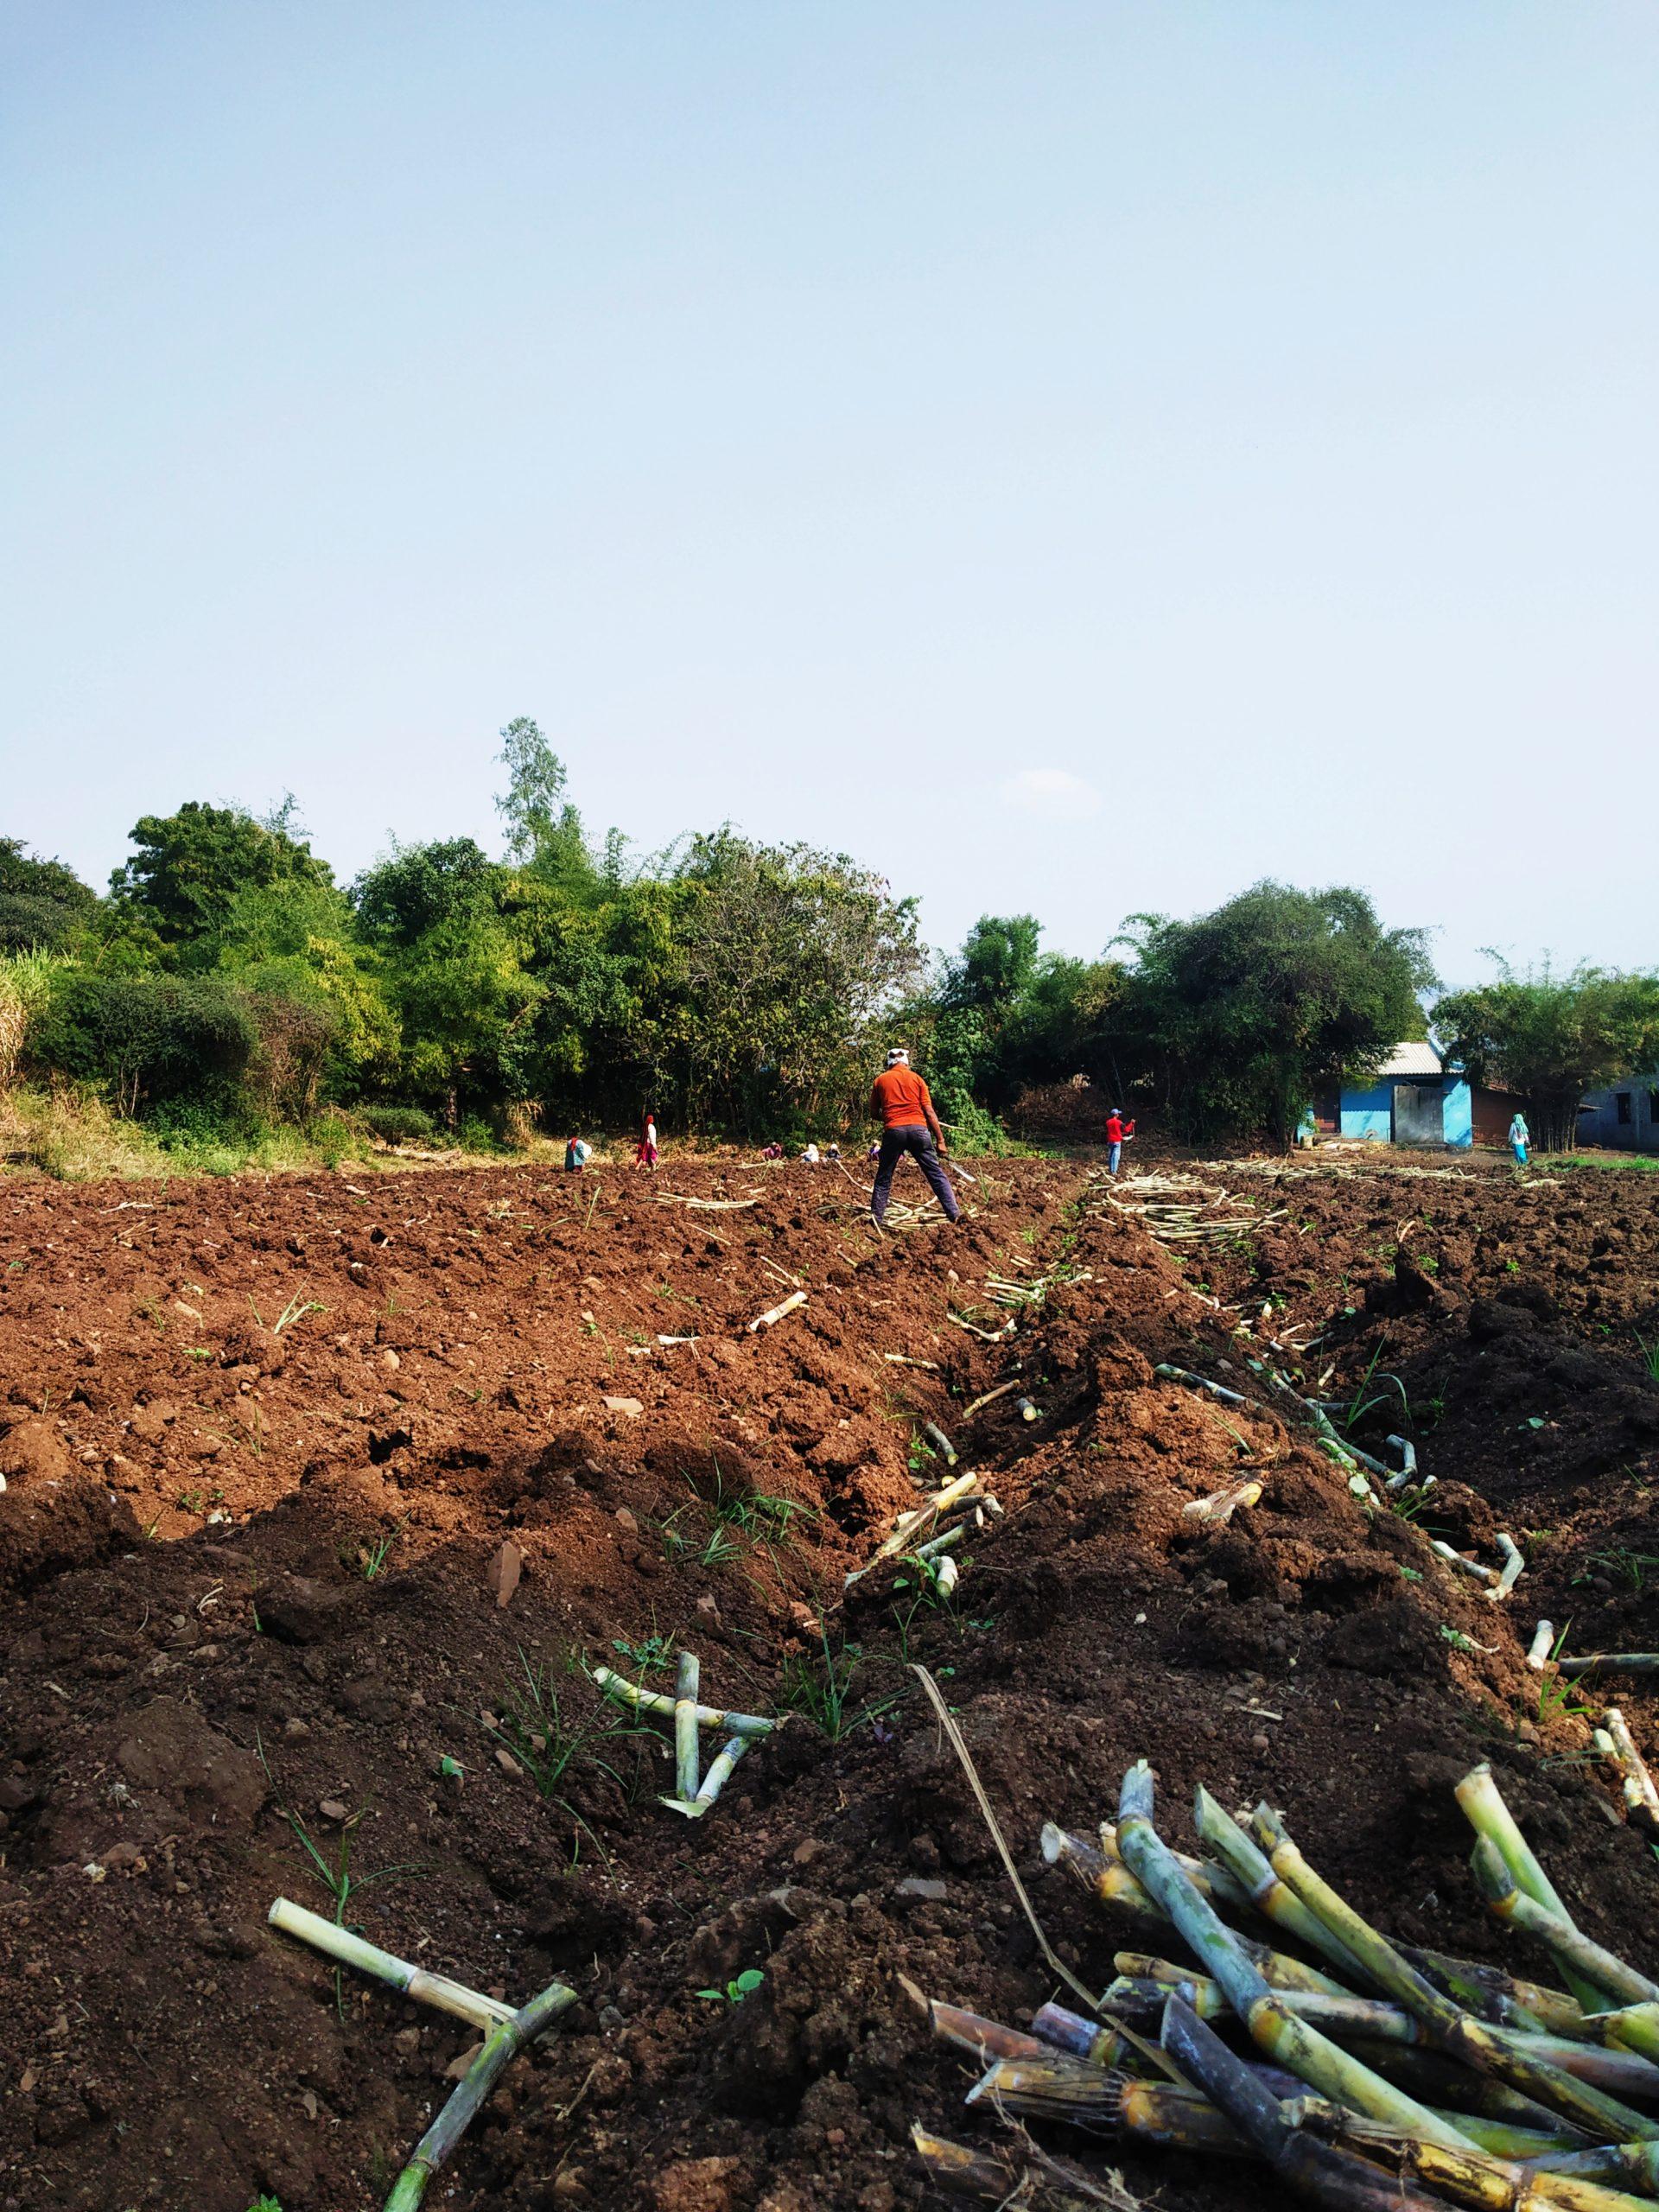 Sugarcane in the farm